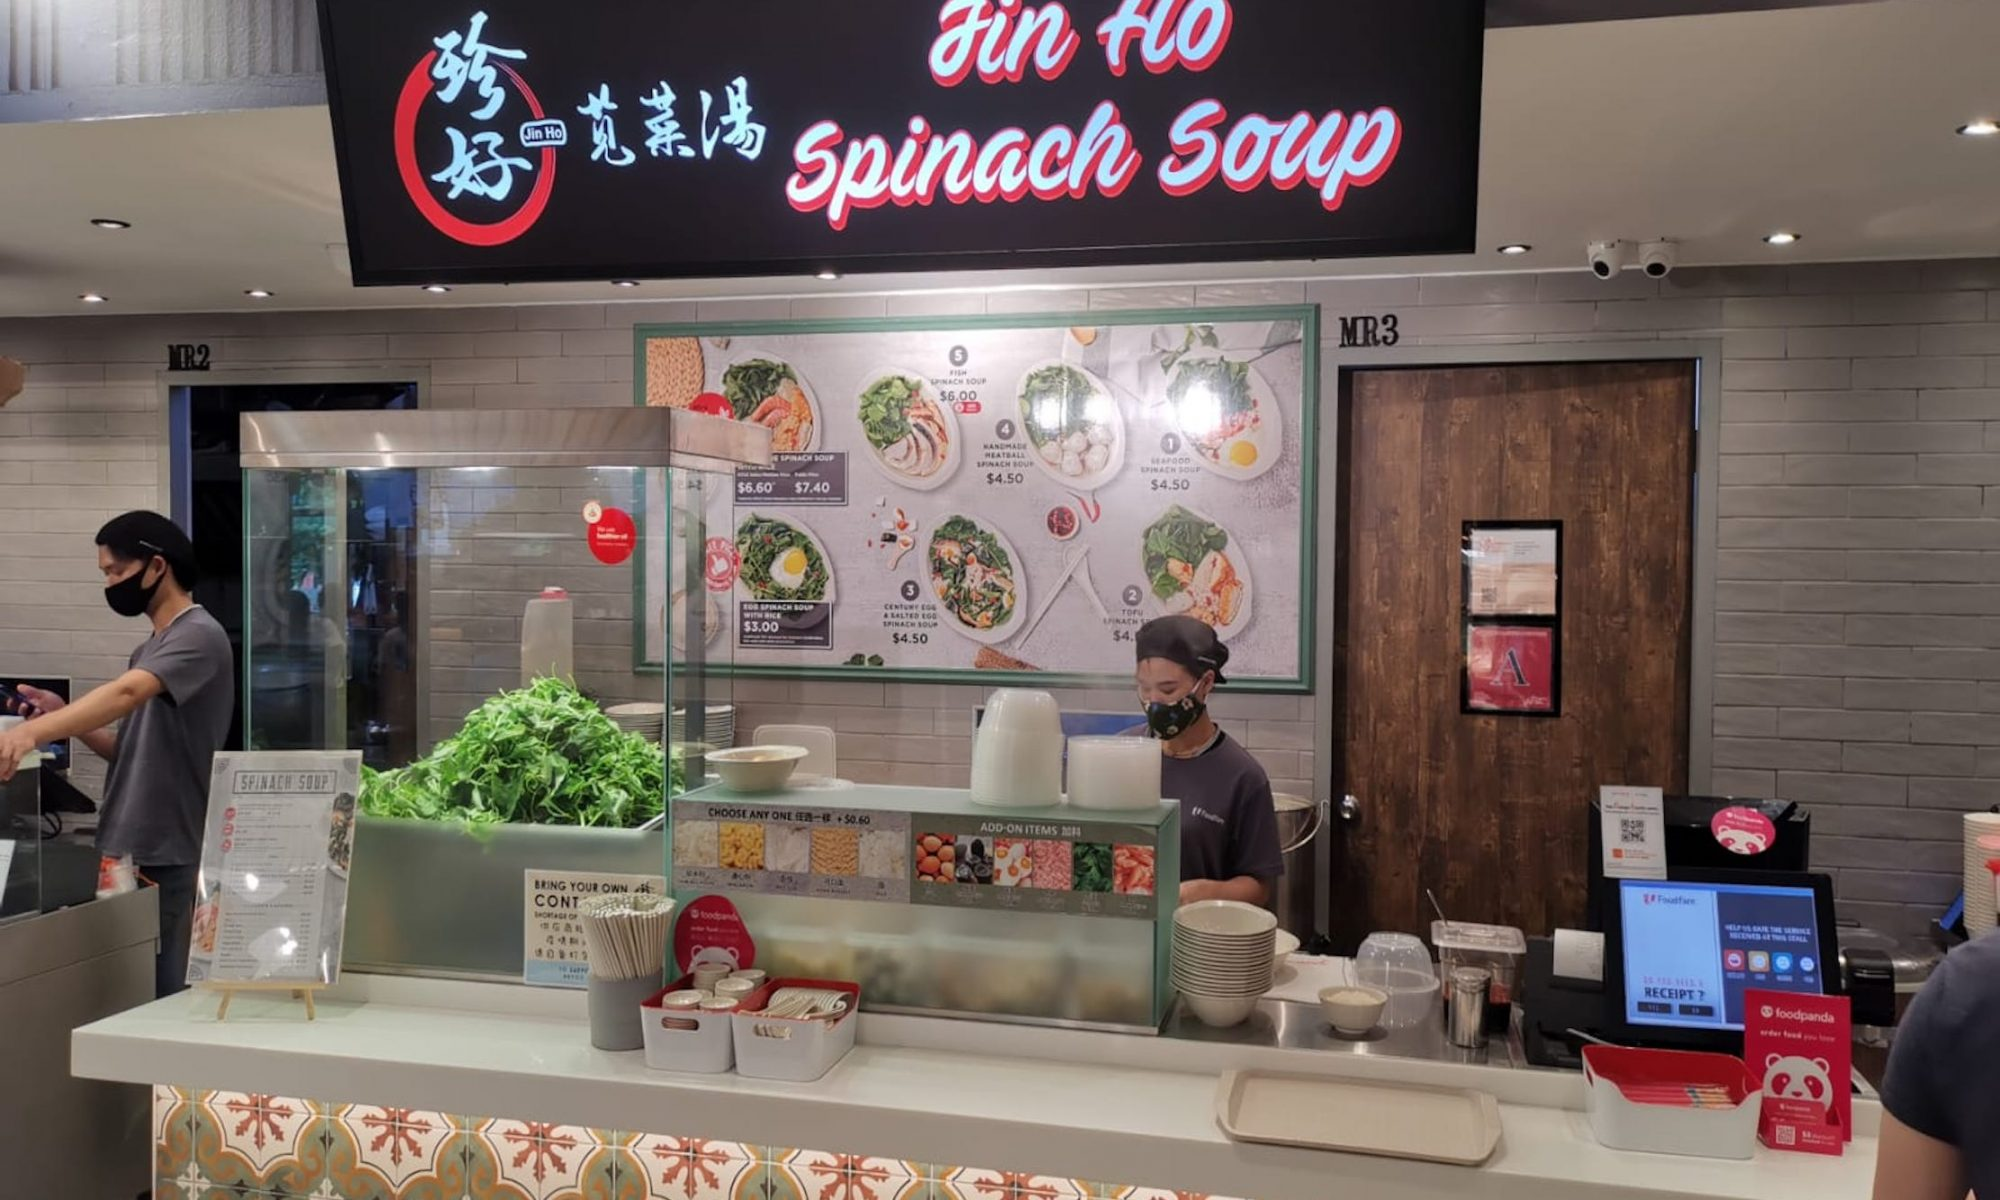 Spinach Soup @ 309 Choa Chu Kang